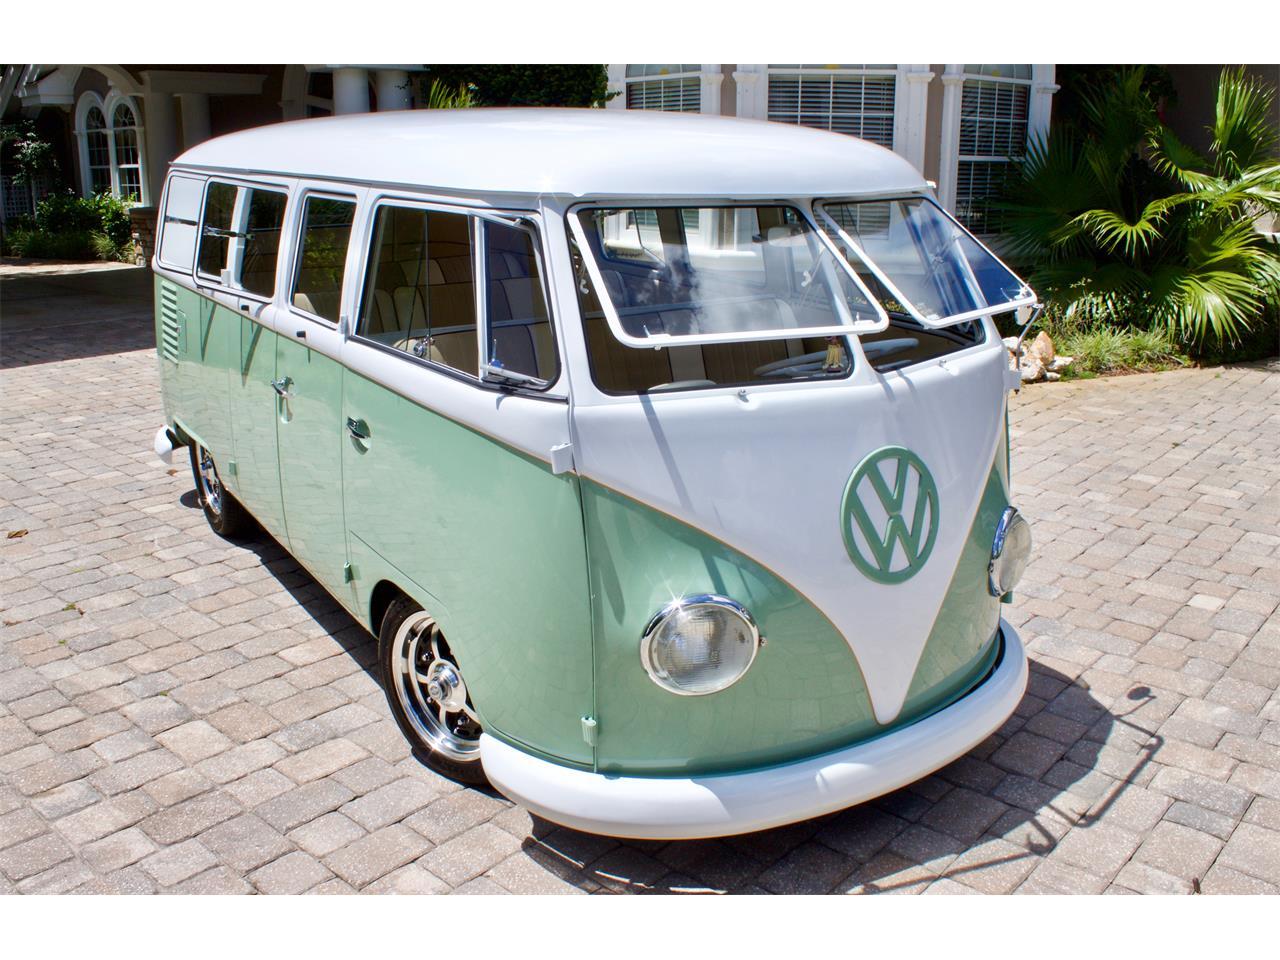 Large Picture of Classic 1962 Bus located in eustis Florida - $59,950.00 - Q2DH